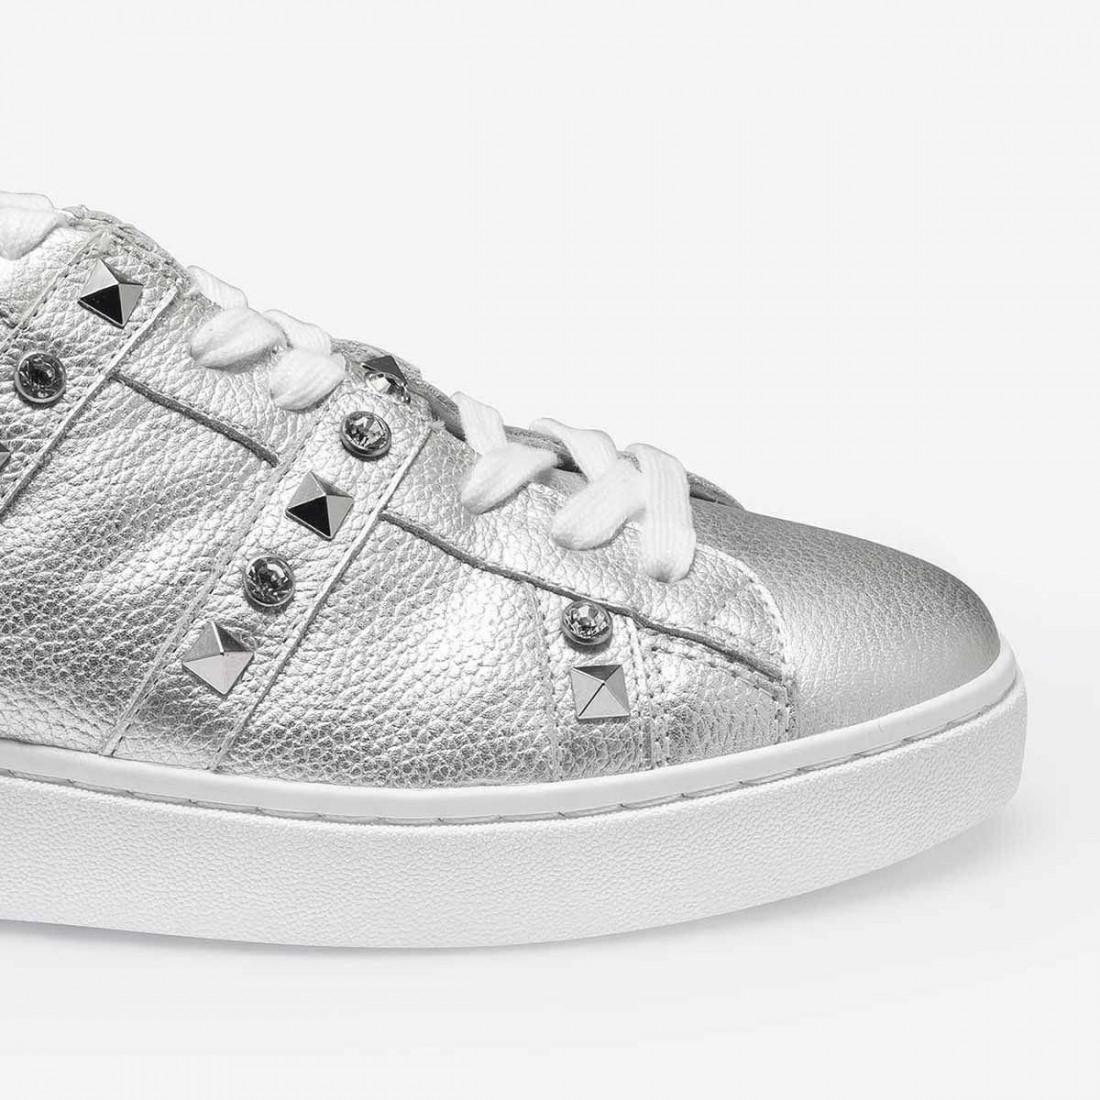 sneakers damen ash s18 party06 2788